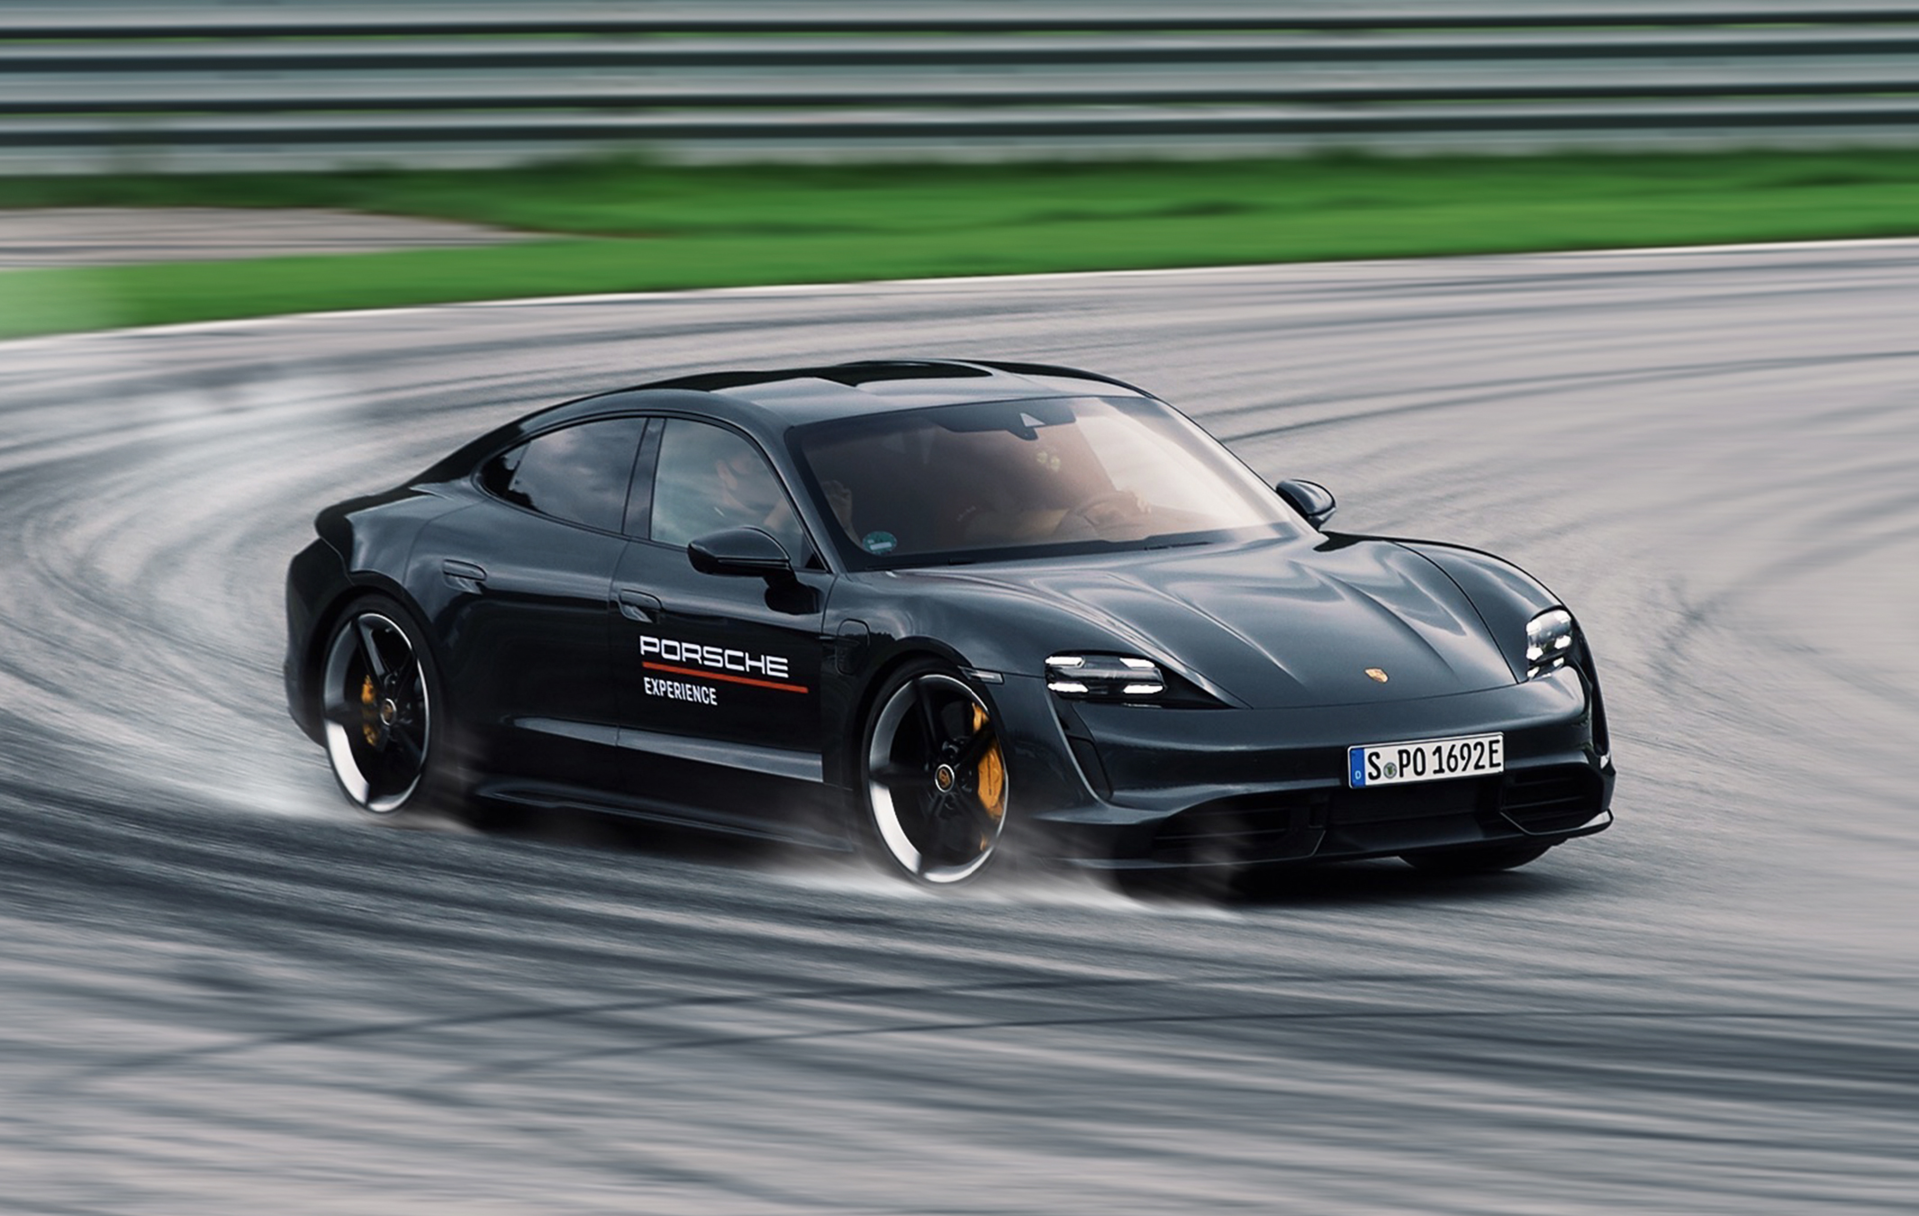 2020 PWRS(Porsche World Road Show)